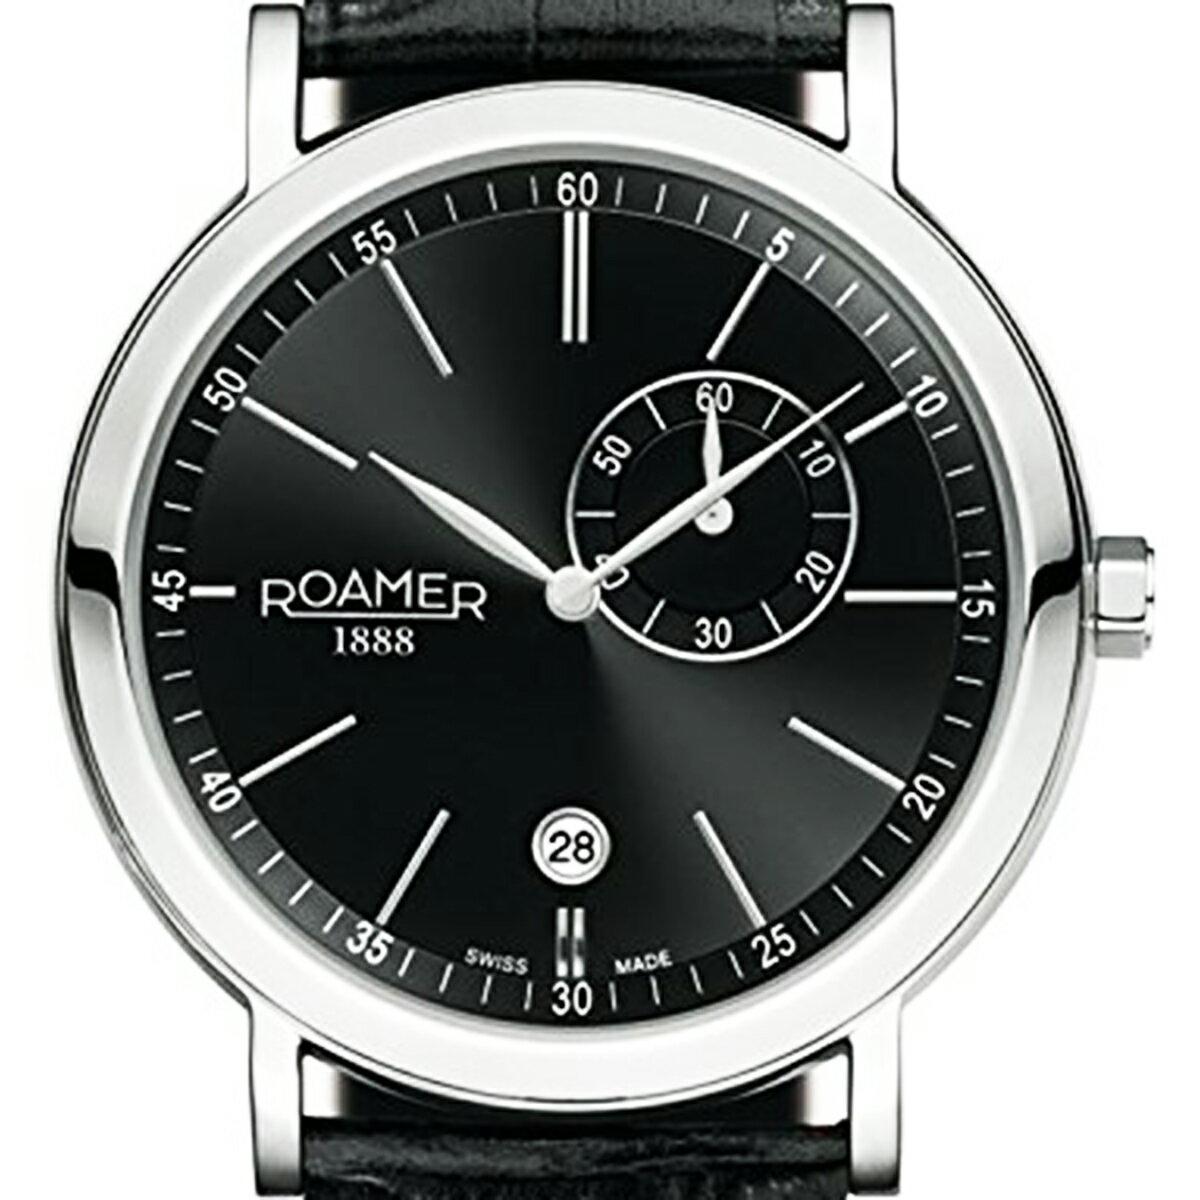 ROAMER ローマー クォーツ 腕時計 メンズ [934950-SL3] 並行輸入品 純正ケース付き 24ヵ月メーカー国際保証 メンズウォッチ 高級 ブランド 腕時計